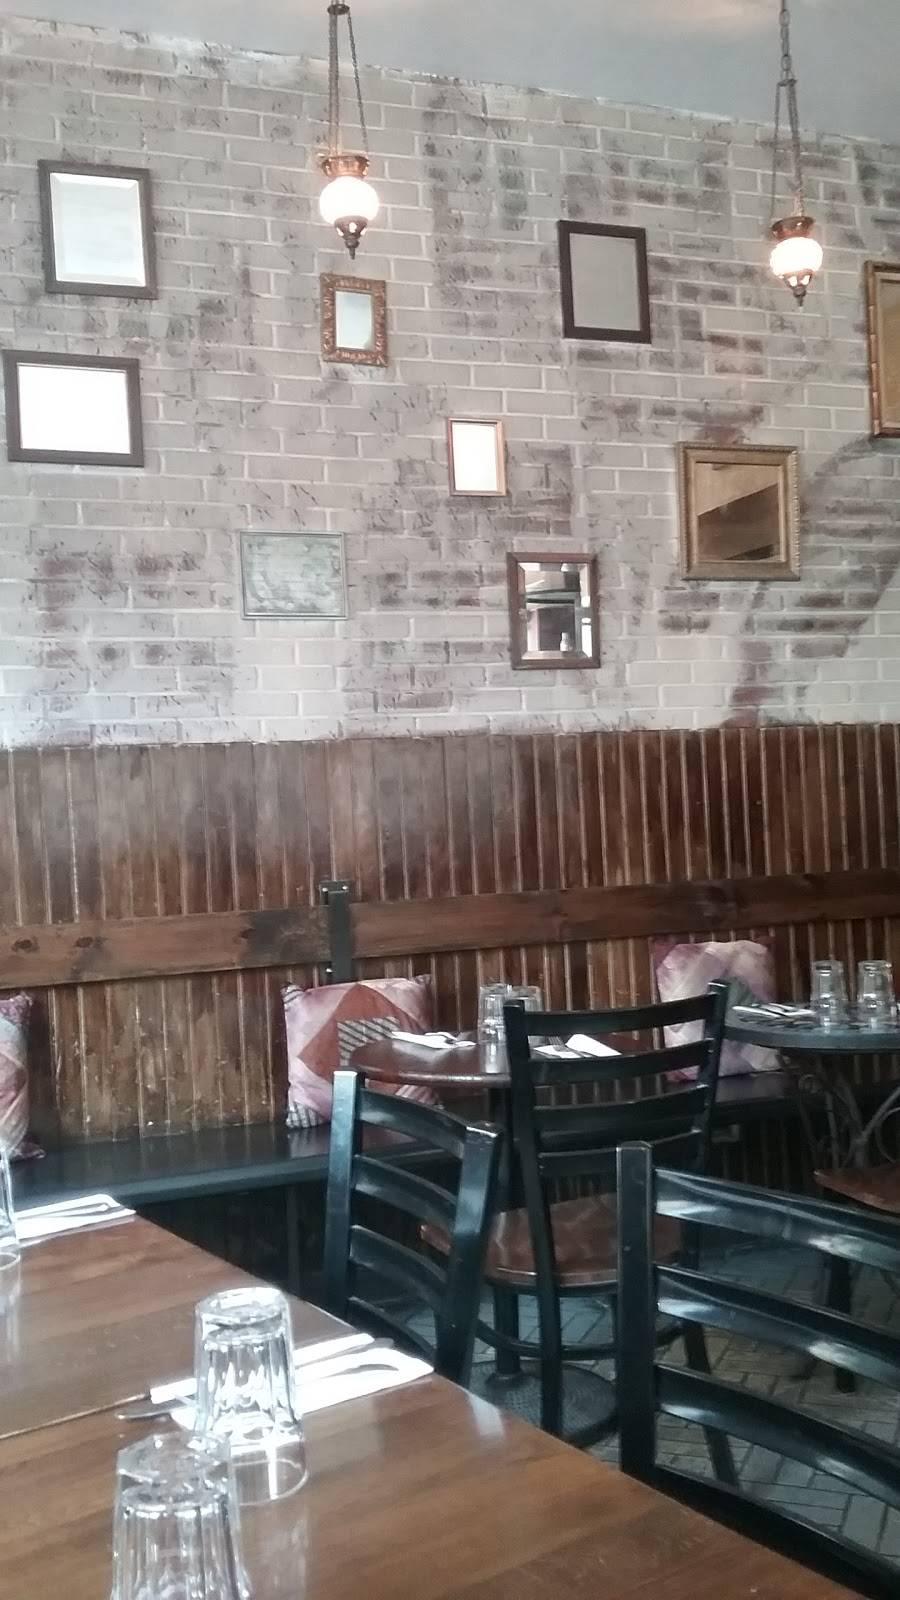 Dar525 | restaurant | 168 Driggs Ave, Brooklyn, NY 11222, USA | 7183890003 OR +1 718-389-0003